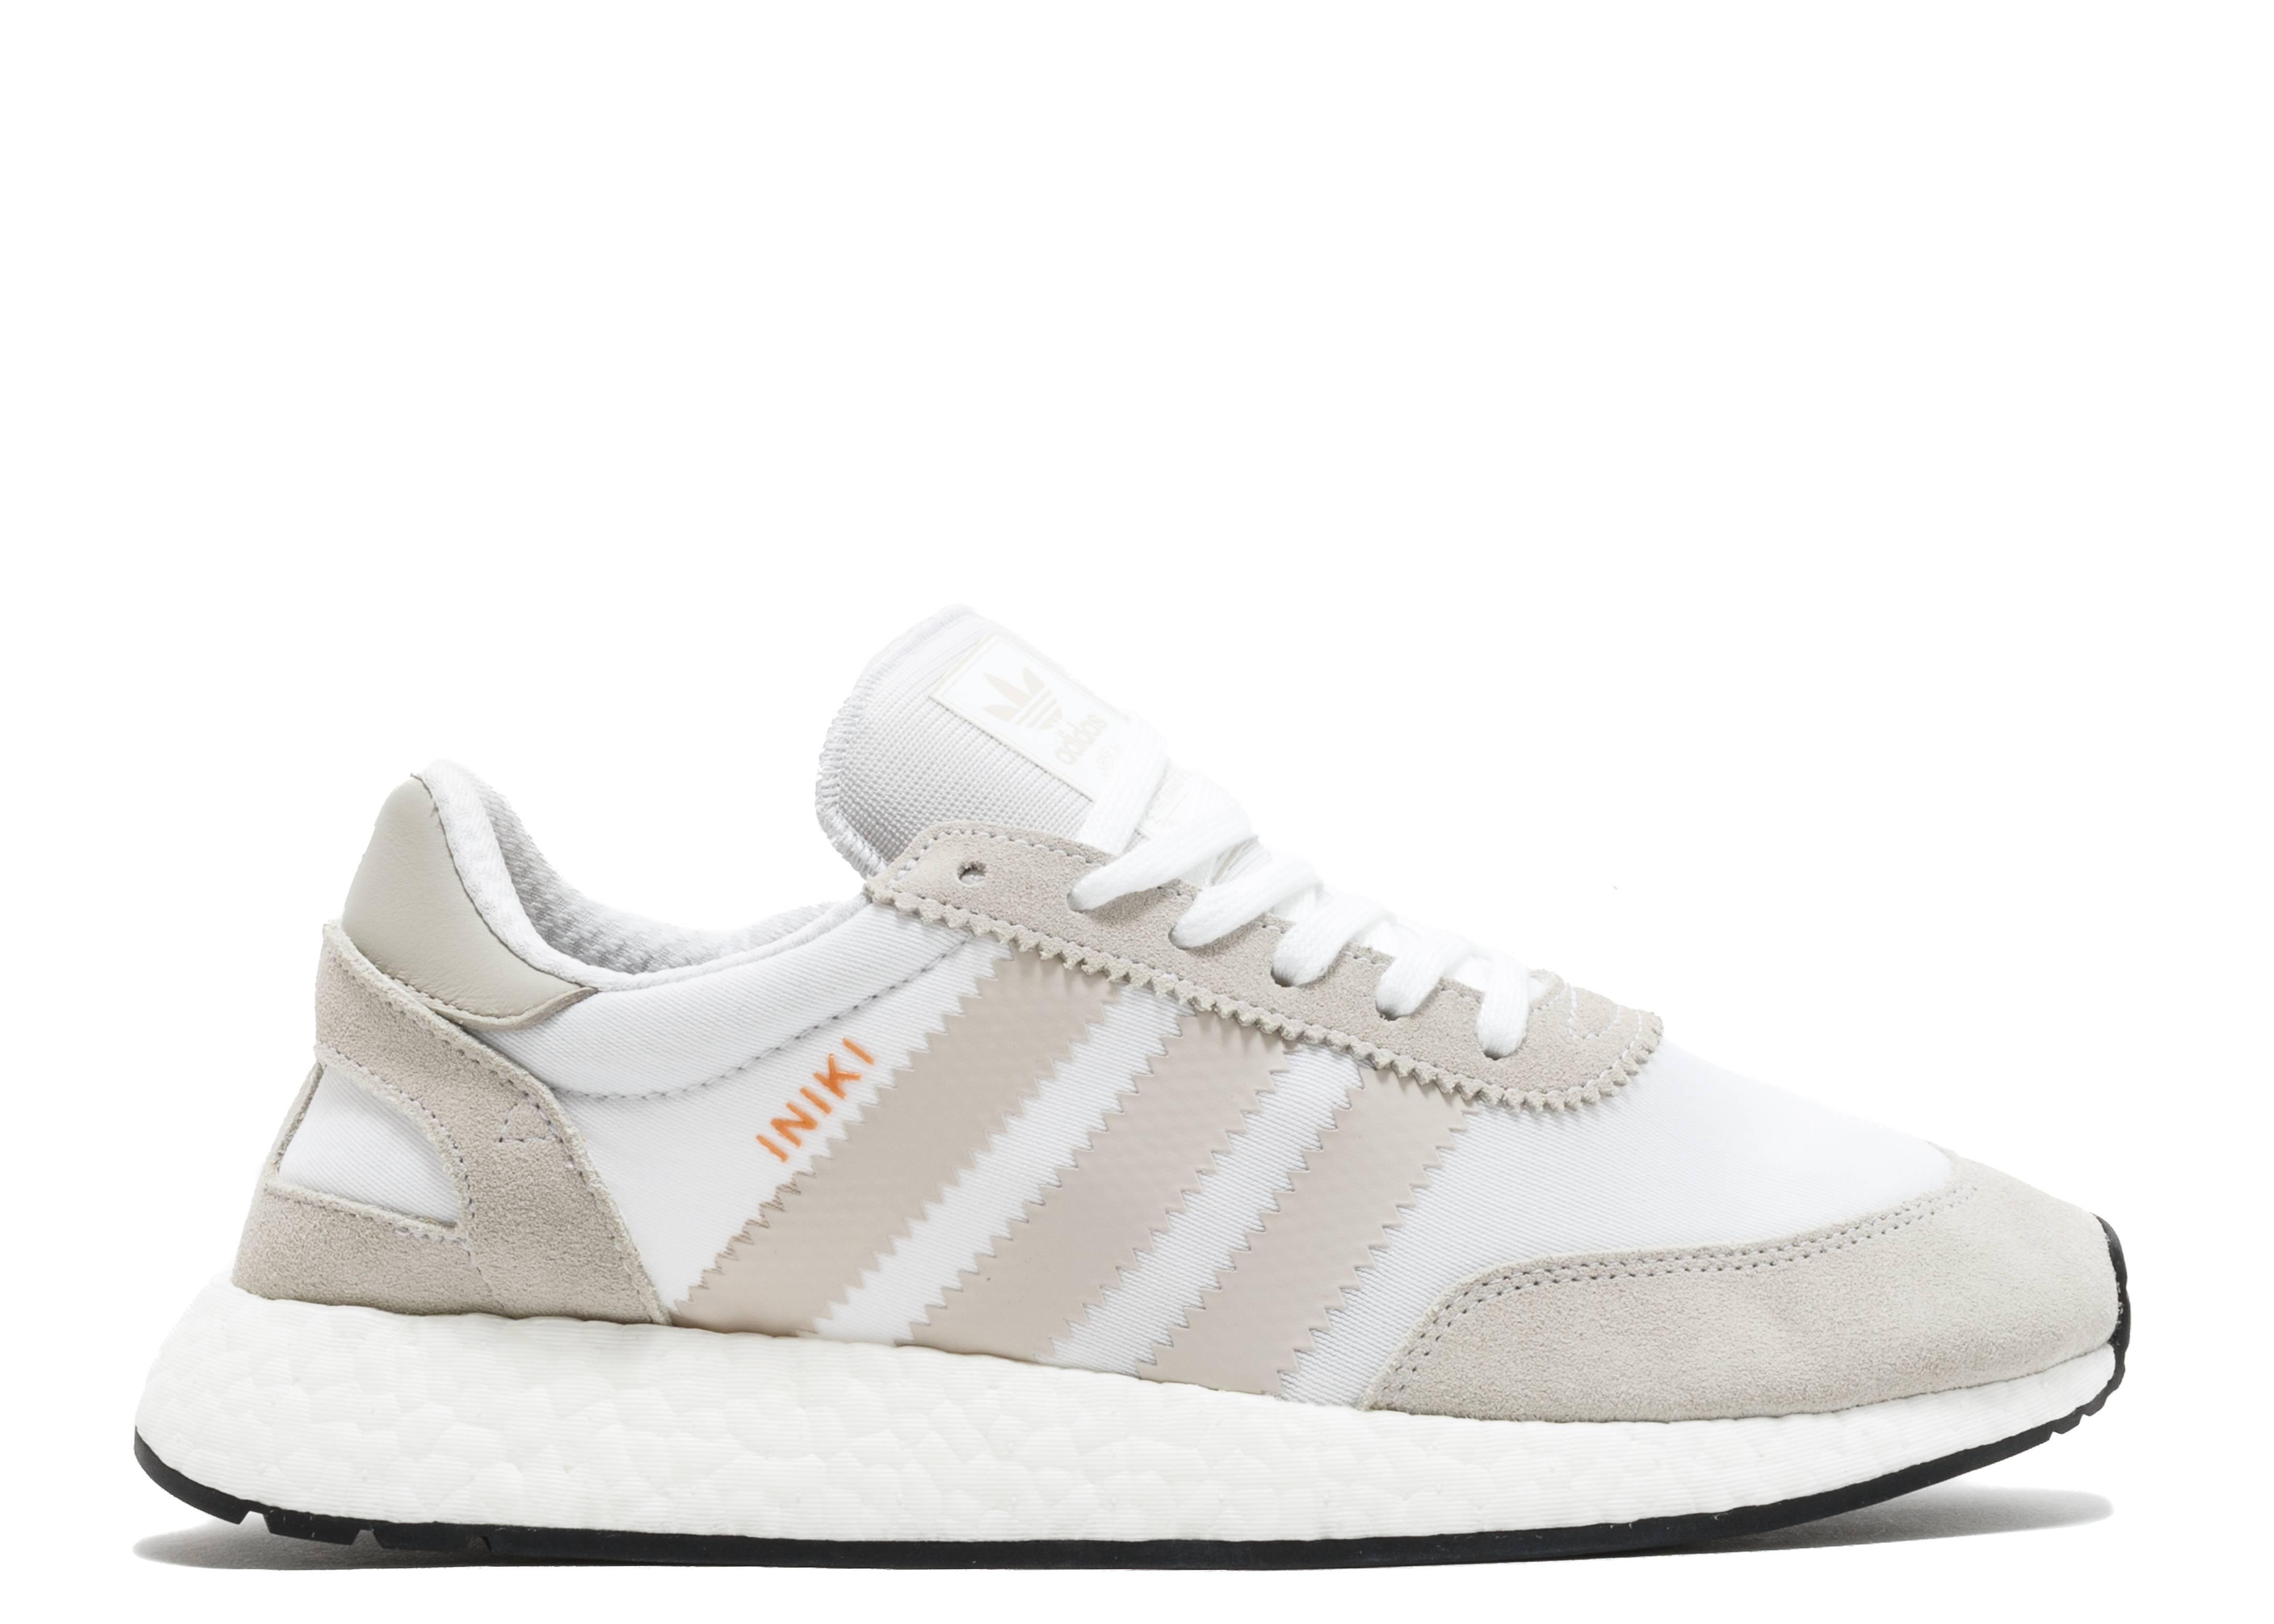 separation shoes 68ffa b5b6f adidas. iniki runner